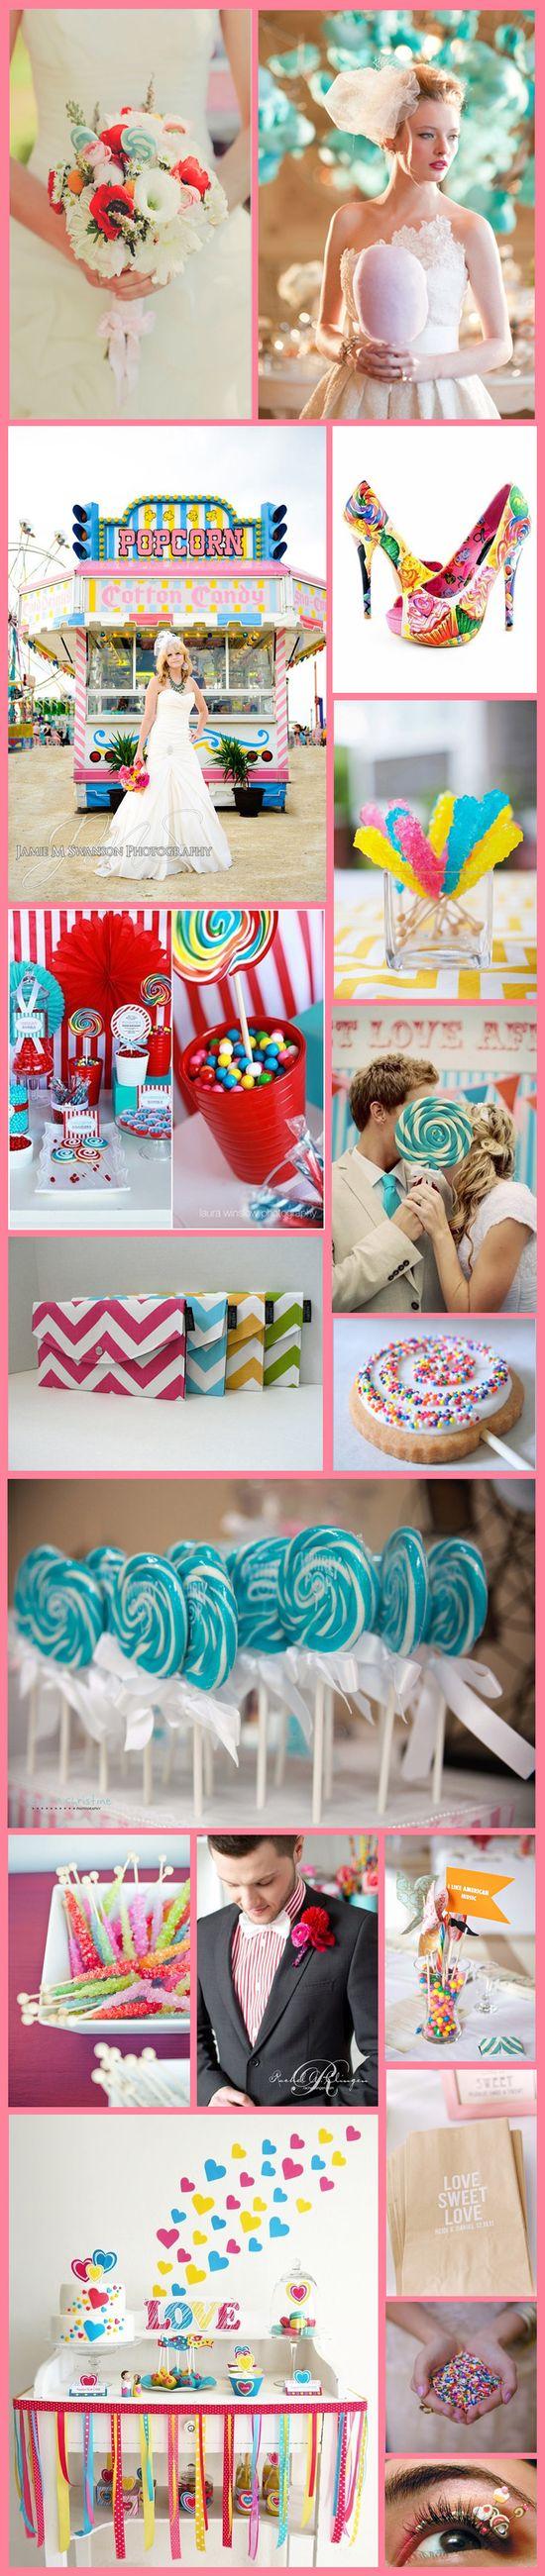 Candy Inspired Wedding Ideas #wedding #bride #weddingideas #weddingplanning #besthairsalon #indianapolis #gmichaelsalon